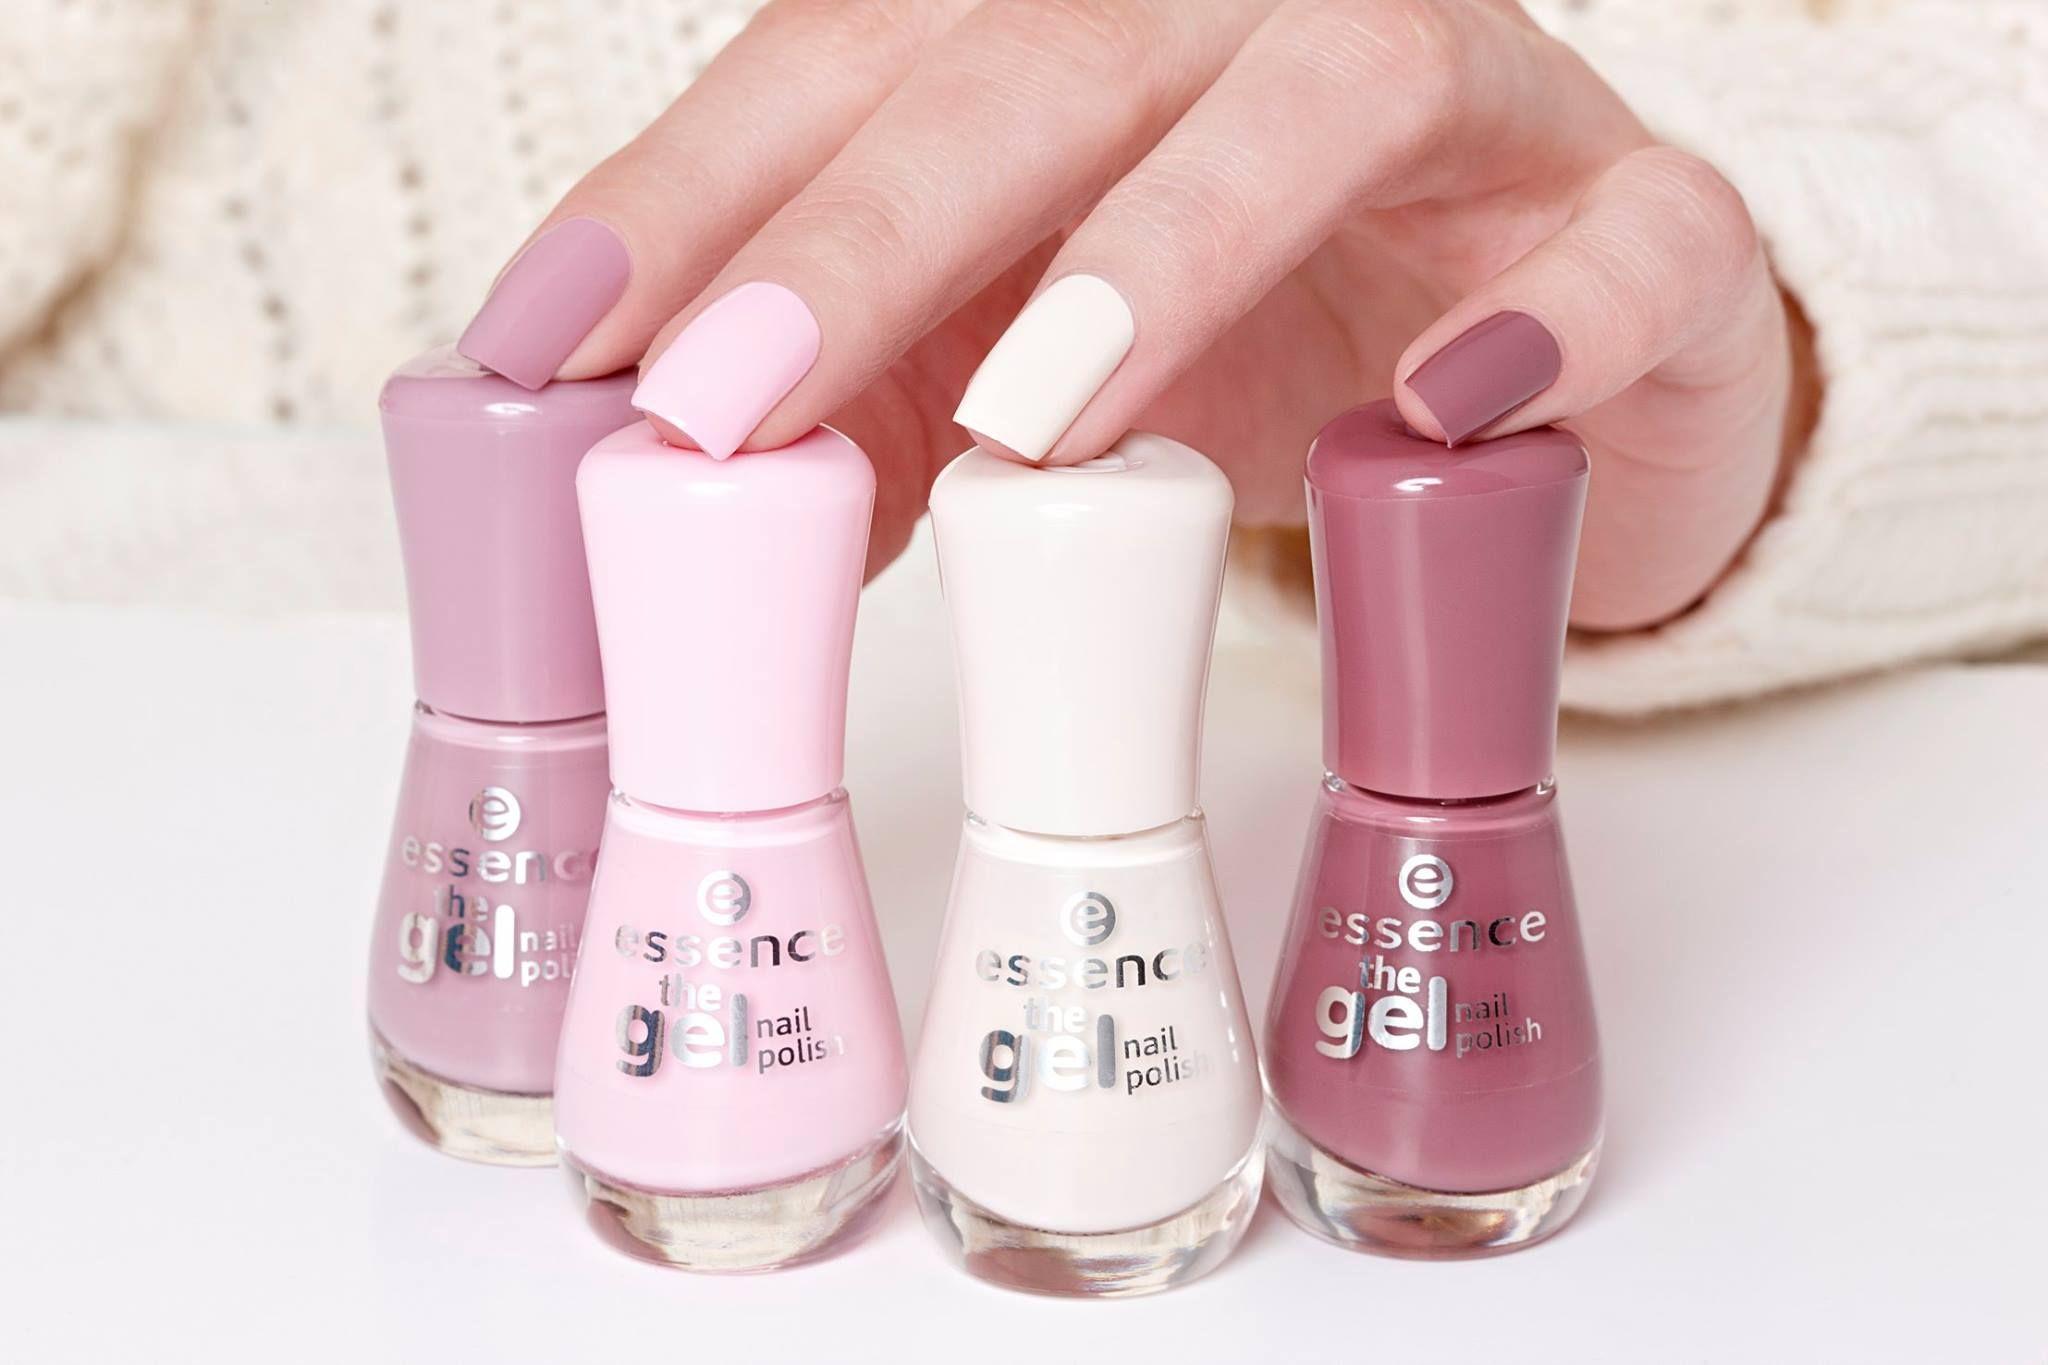 Resultado de imagen para essence nail polish 56 | Nails | Pinterest ...